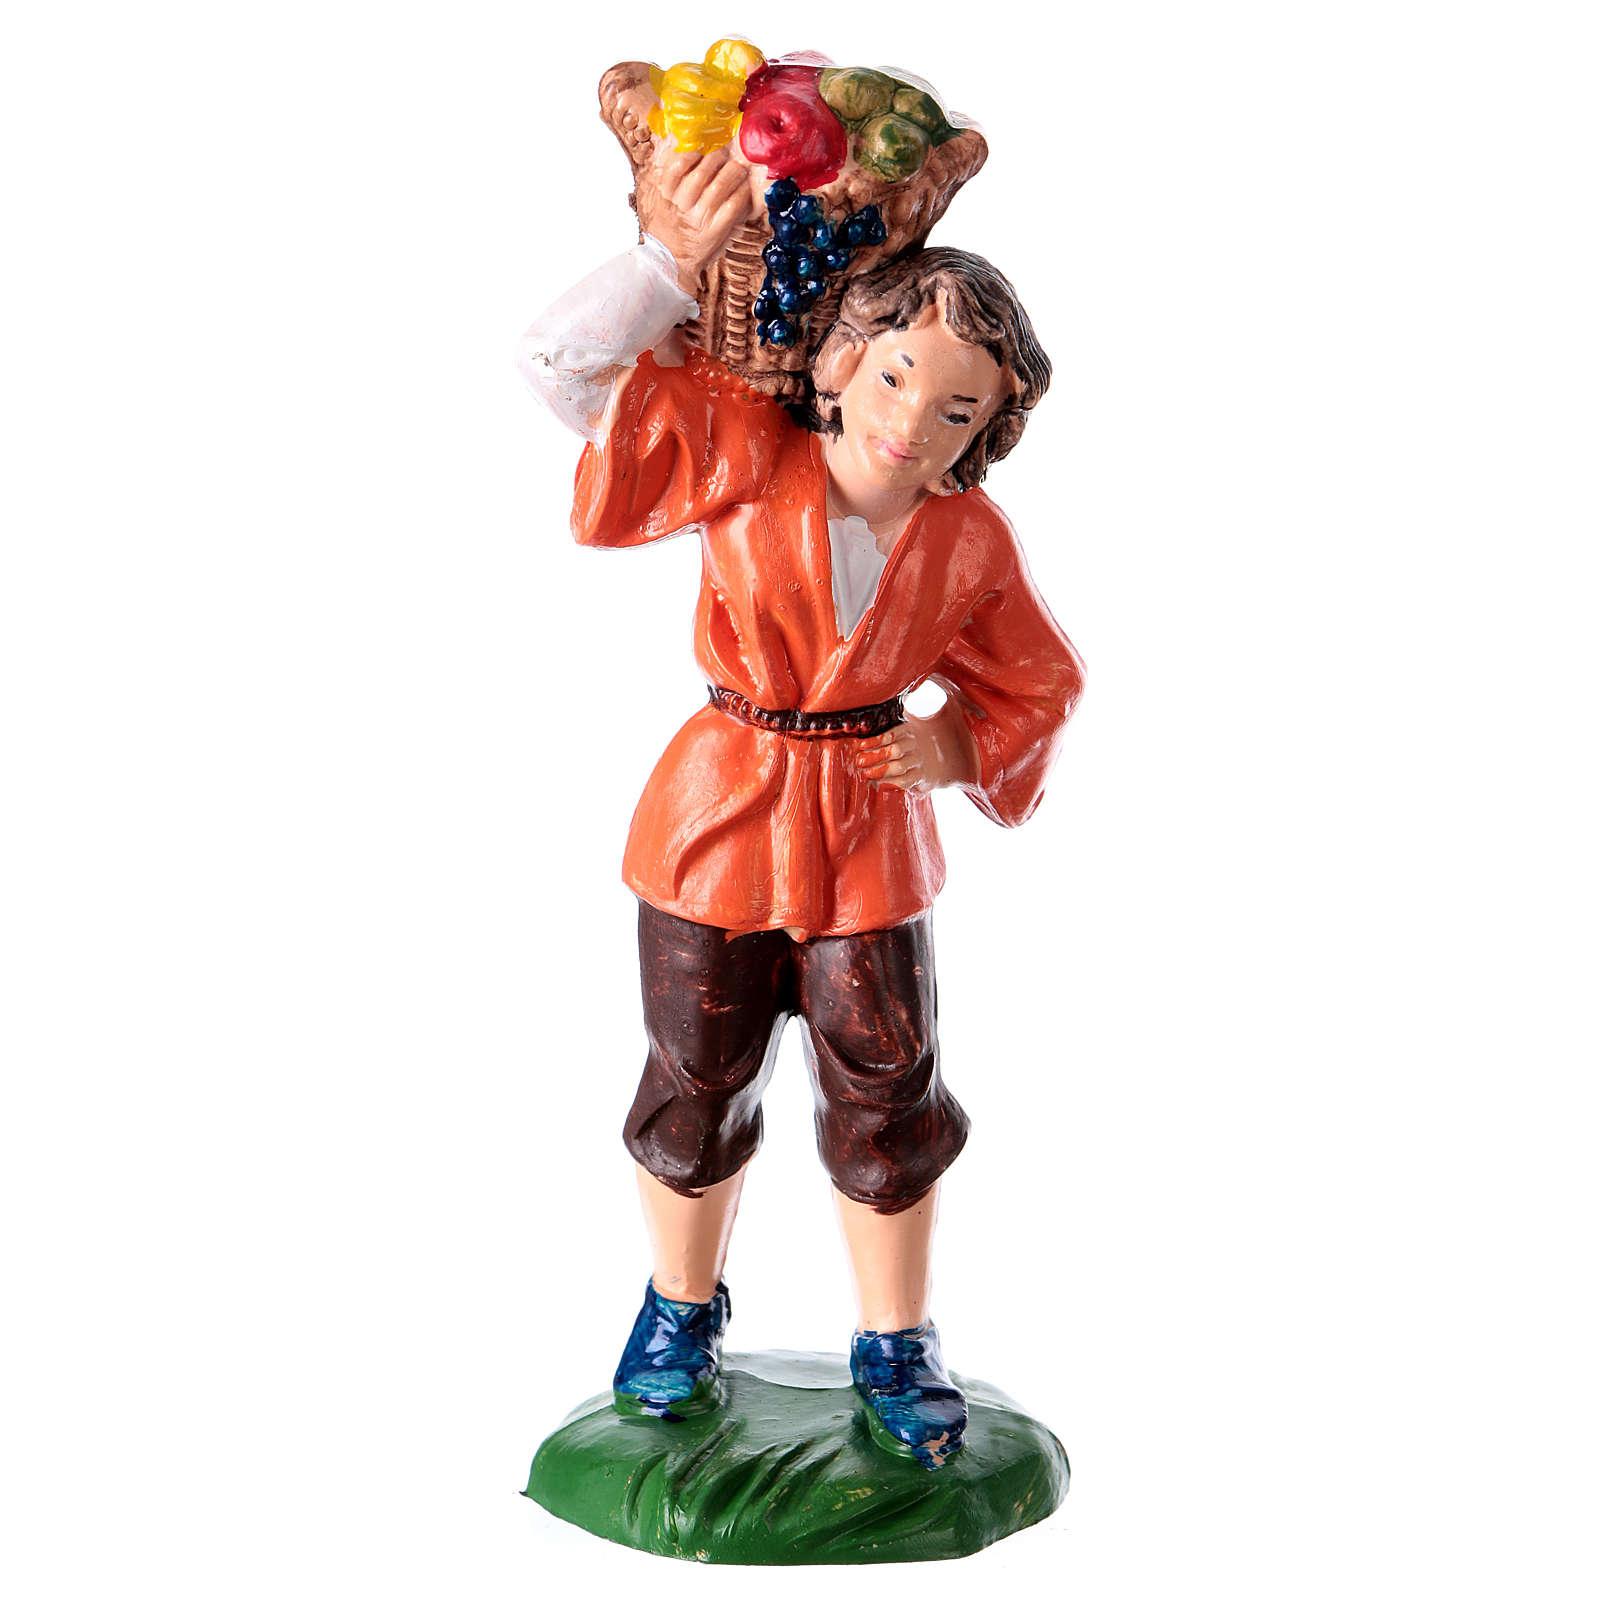 Estatua Hombre con cesta 10 cm de altura media para belén 3